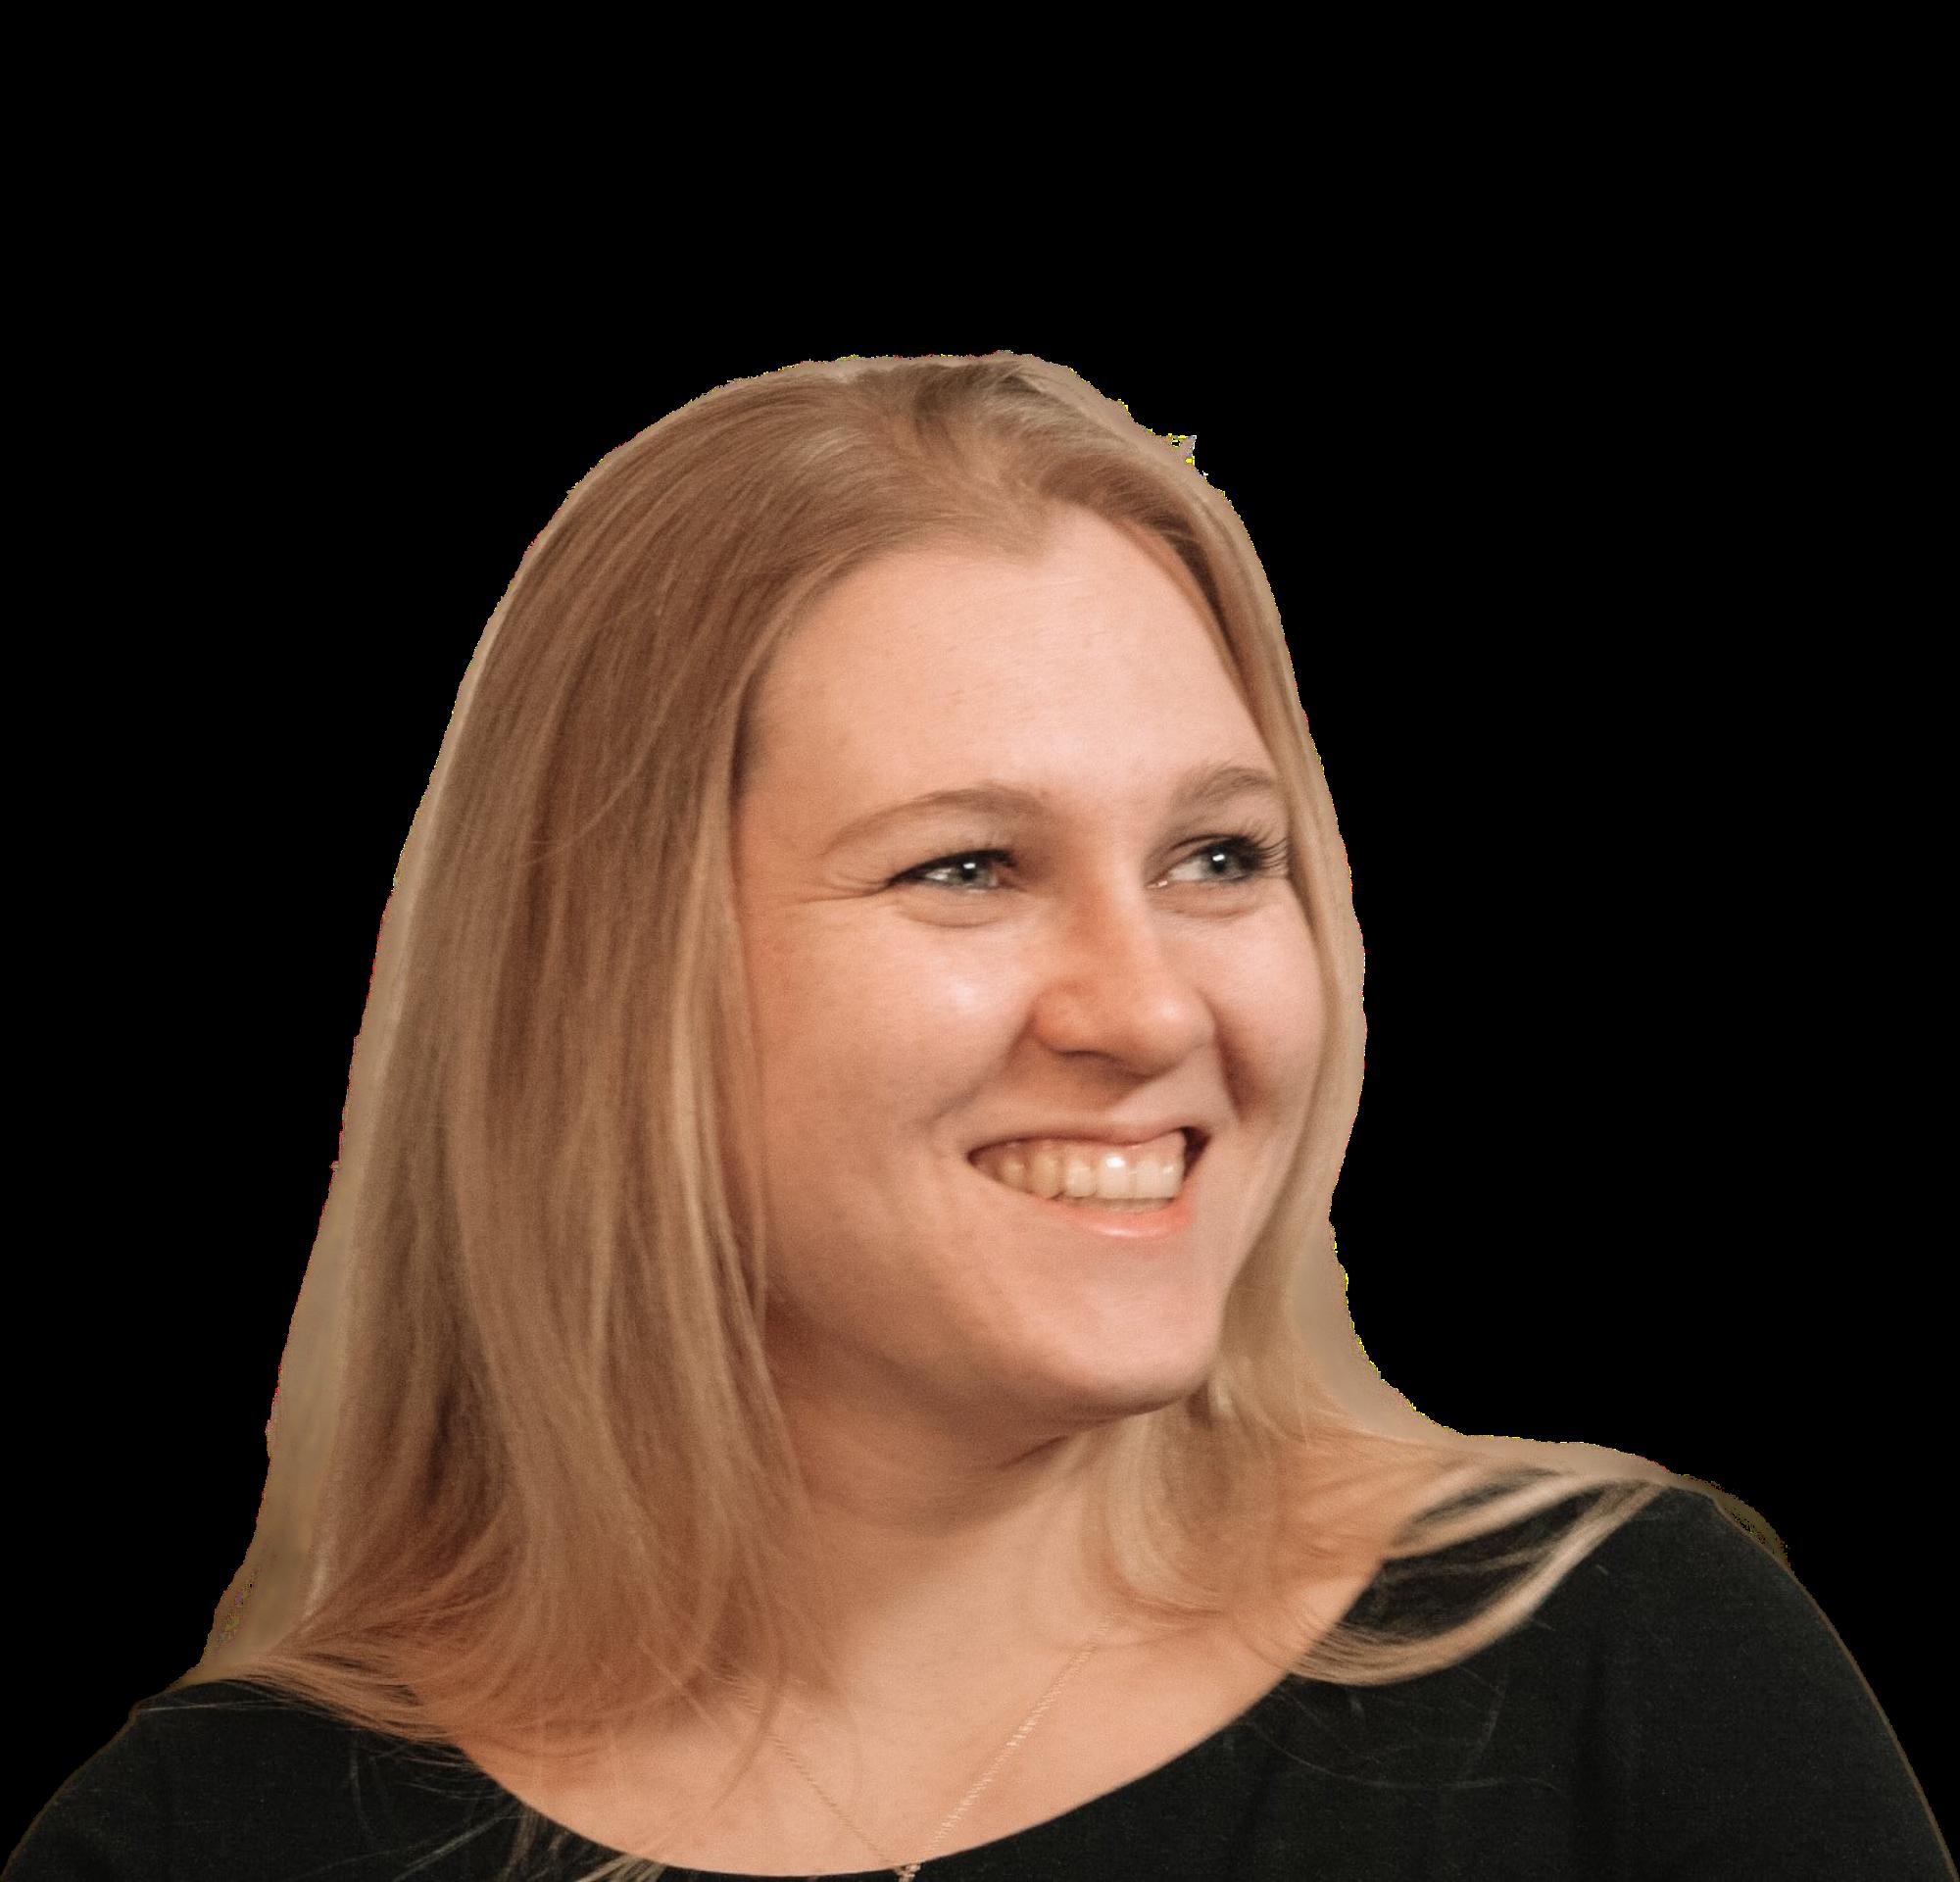 Jennifer Stampp Website & Business Mentoring